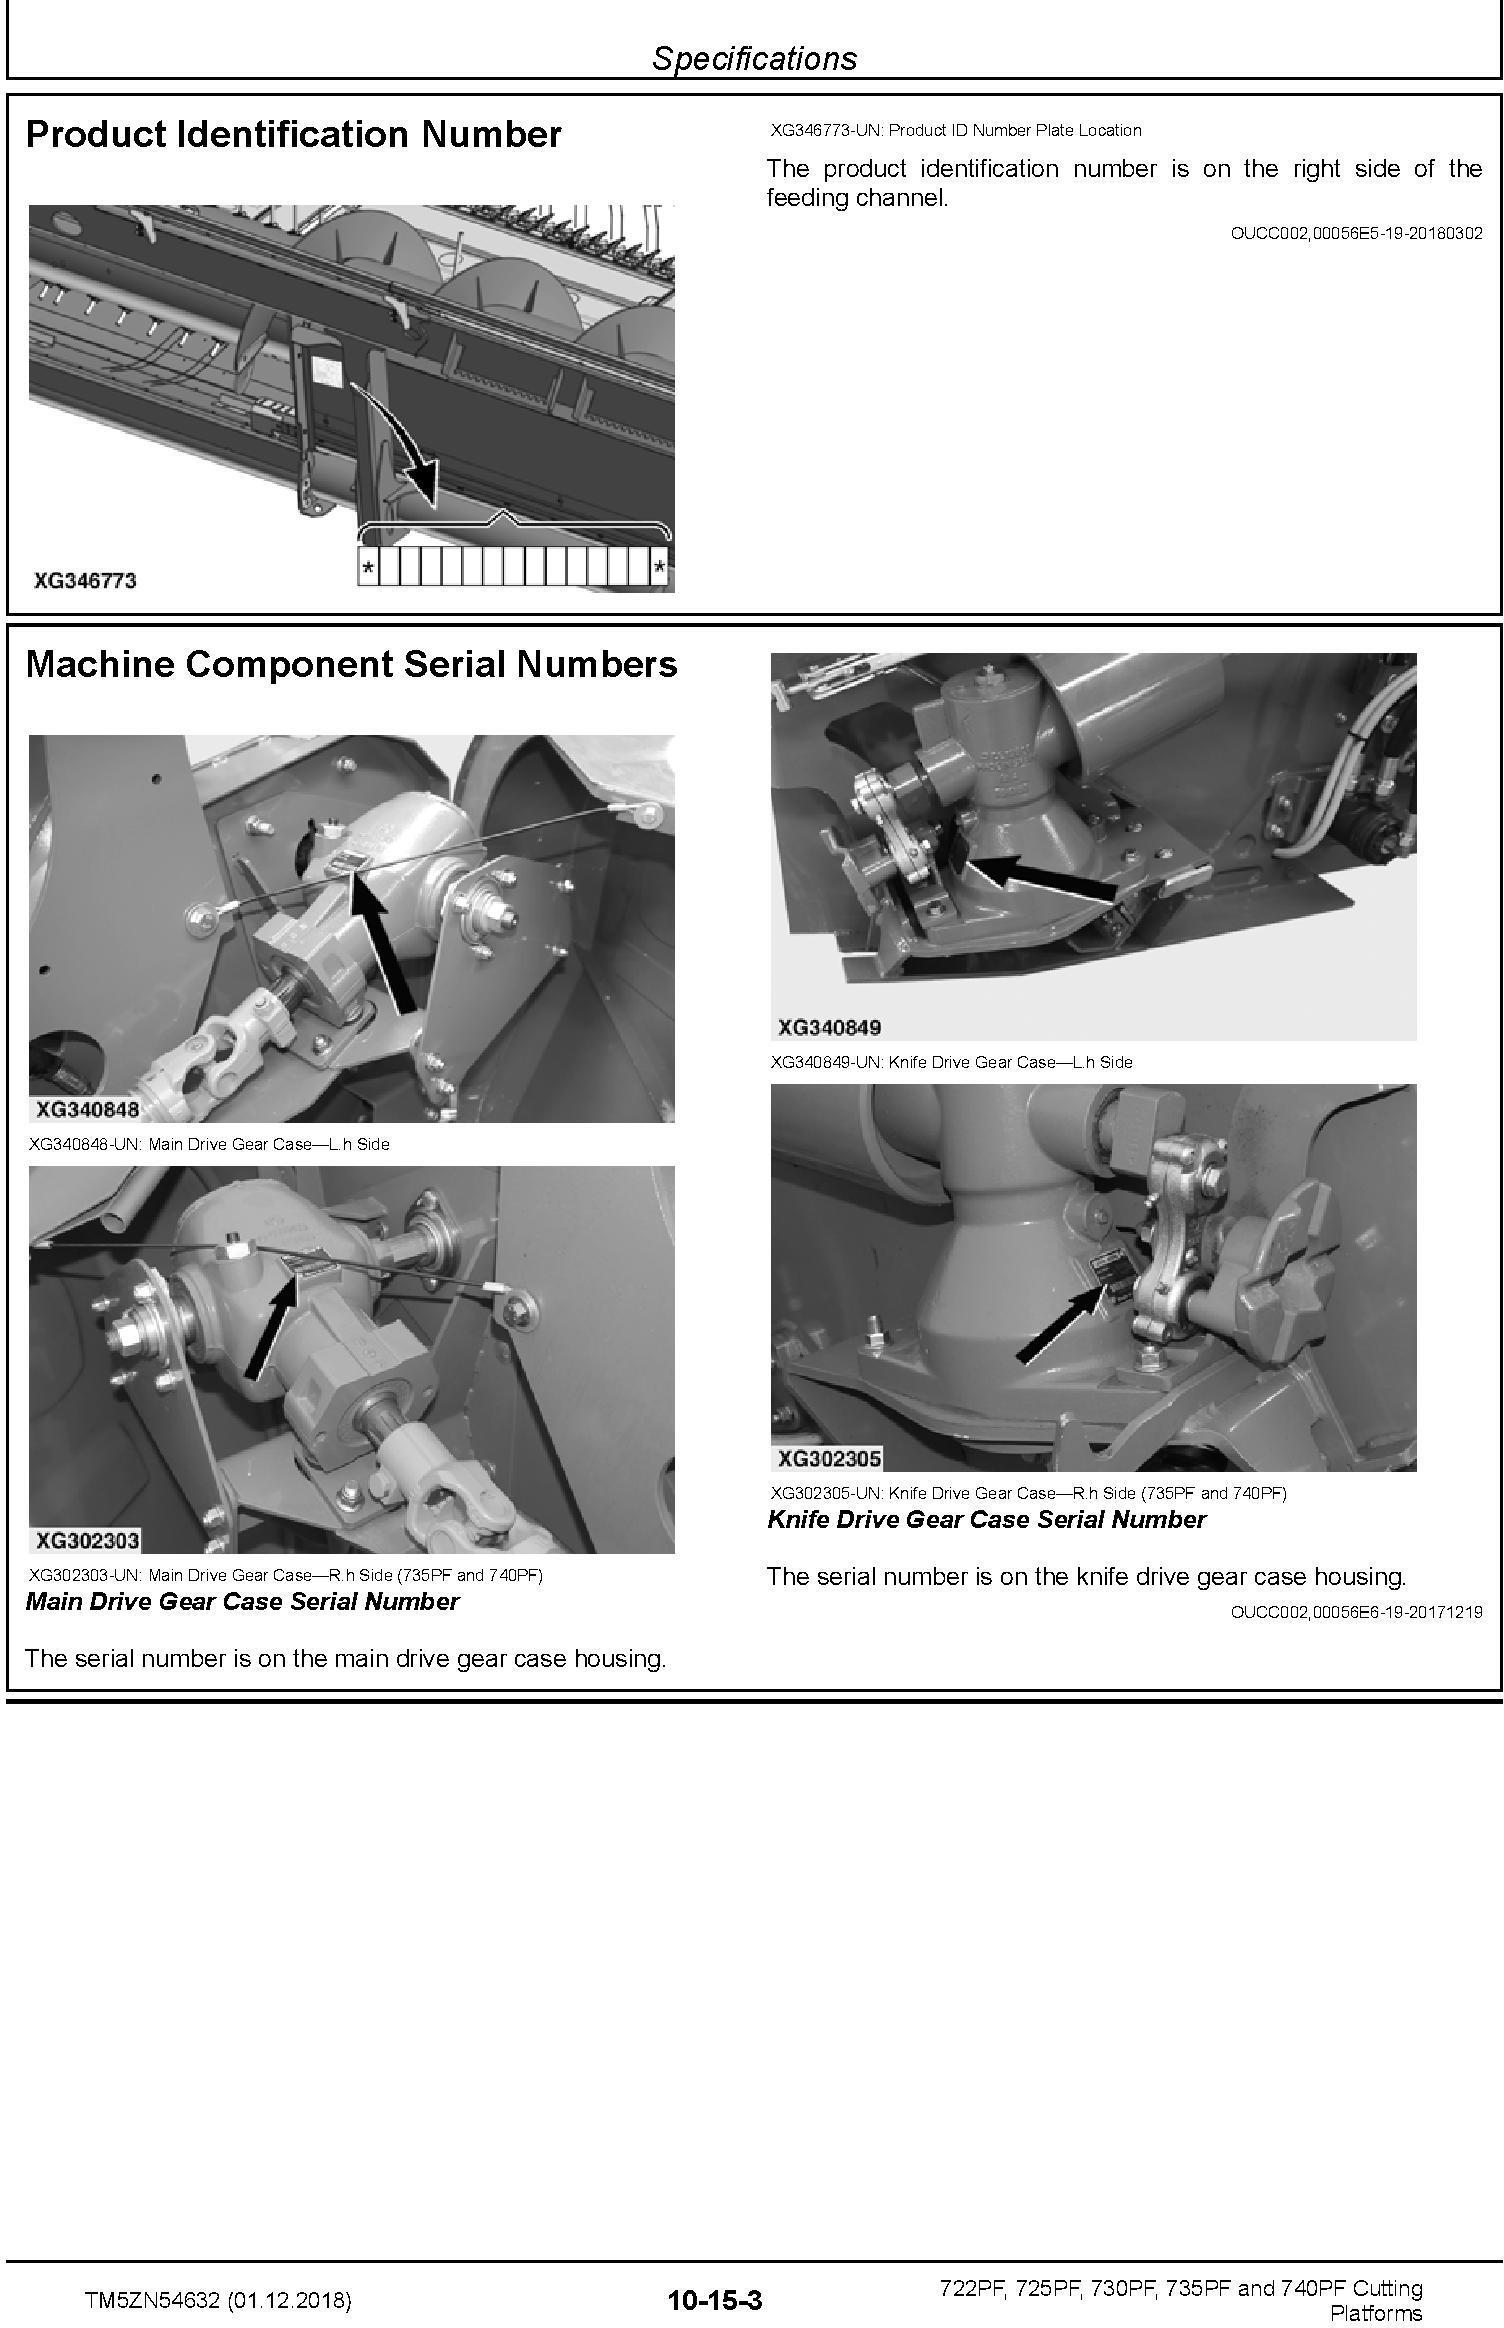 John Deere 722PF, 725PF, 730PF, 735PF and 740PF Cutting Platforms Technical Manual (TM5ZN54632) - 1